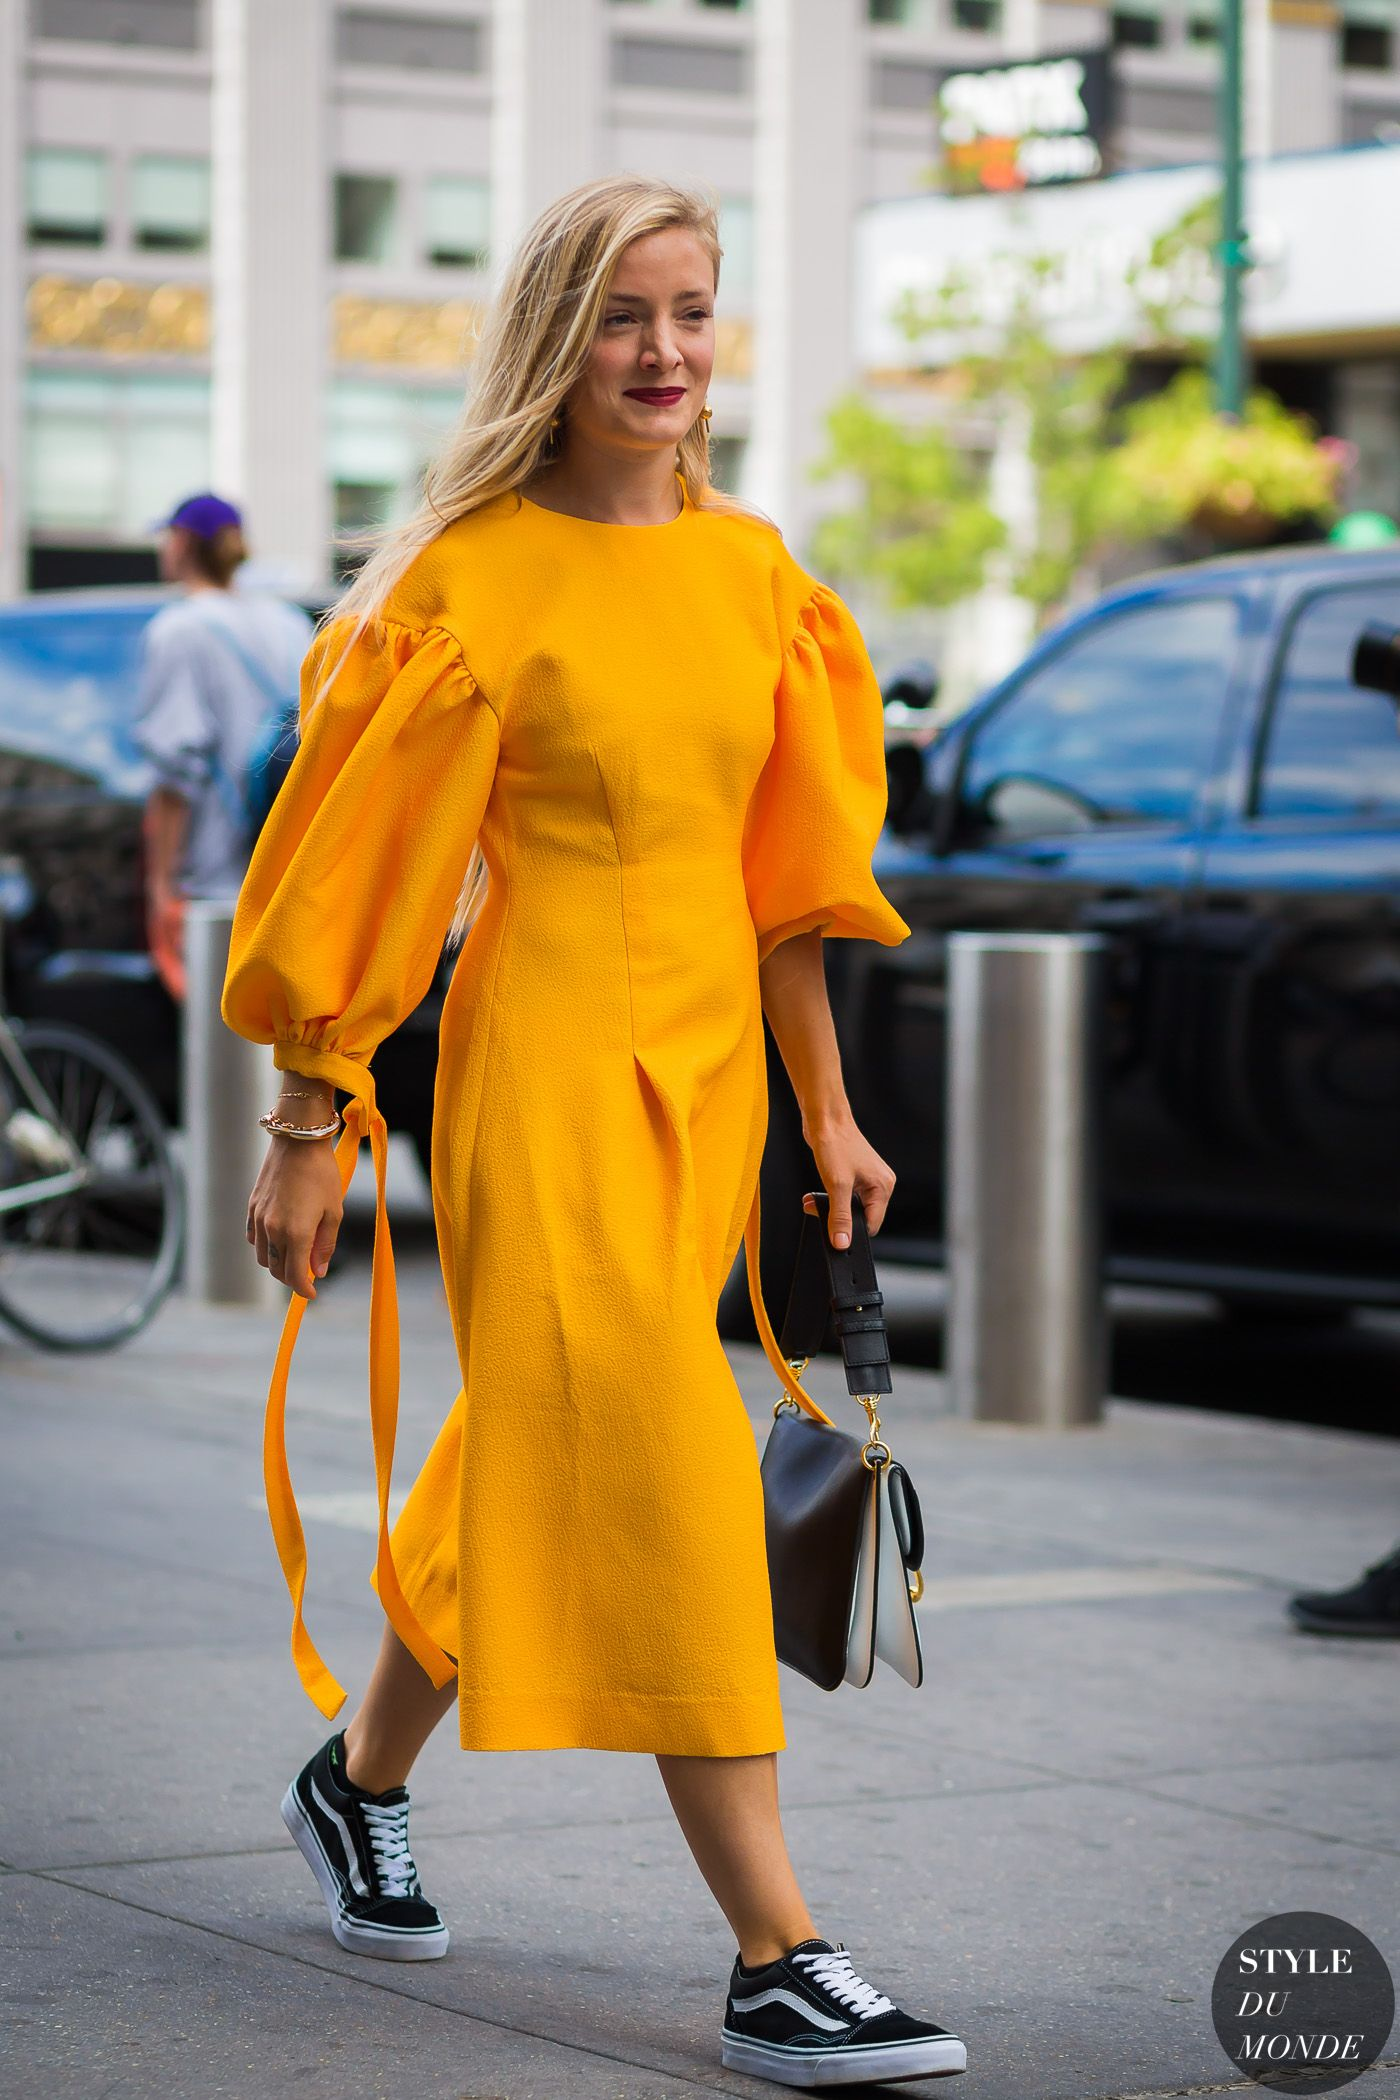 New York SS 2017 Street Style: Kate Foley (STYLE DU MONDE ...